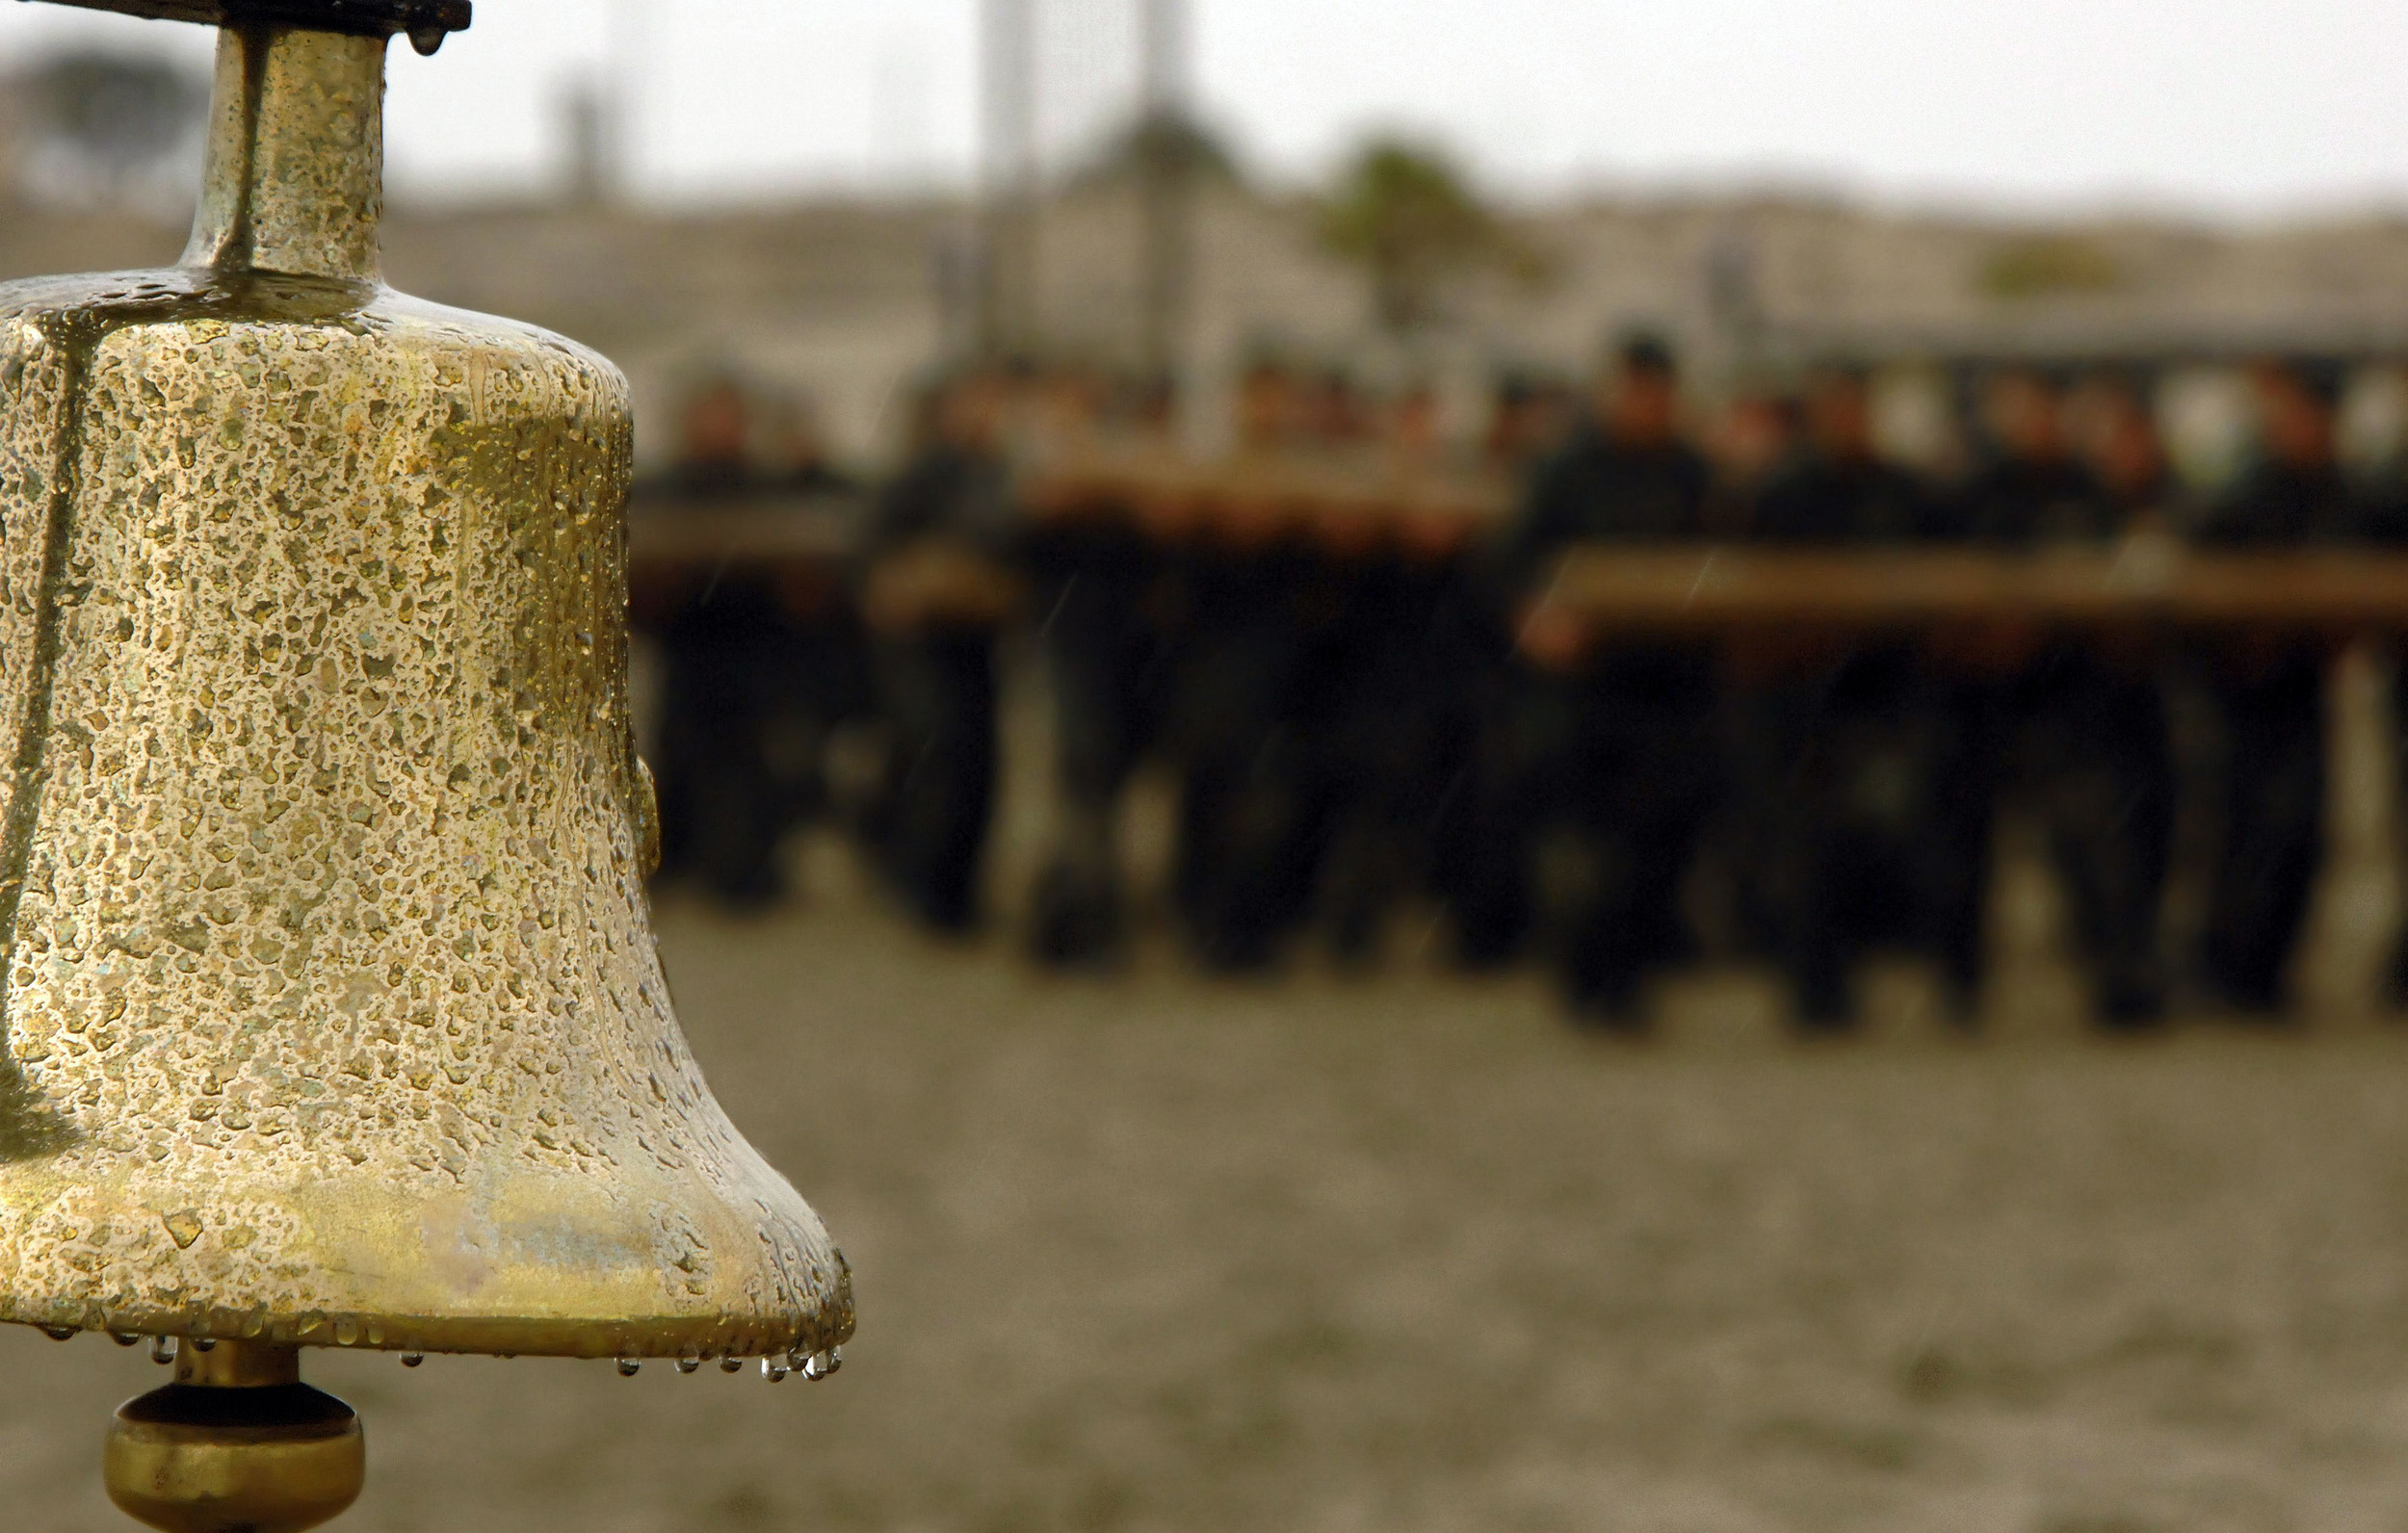 Navy dismisses SEAL team leaders, cites discipline failures